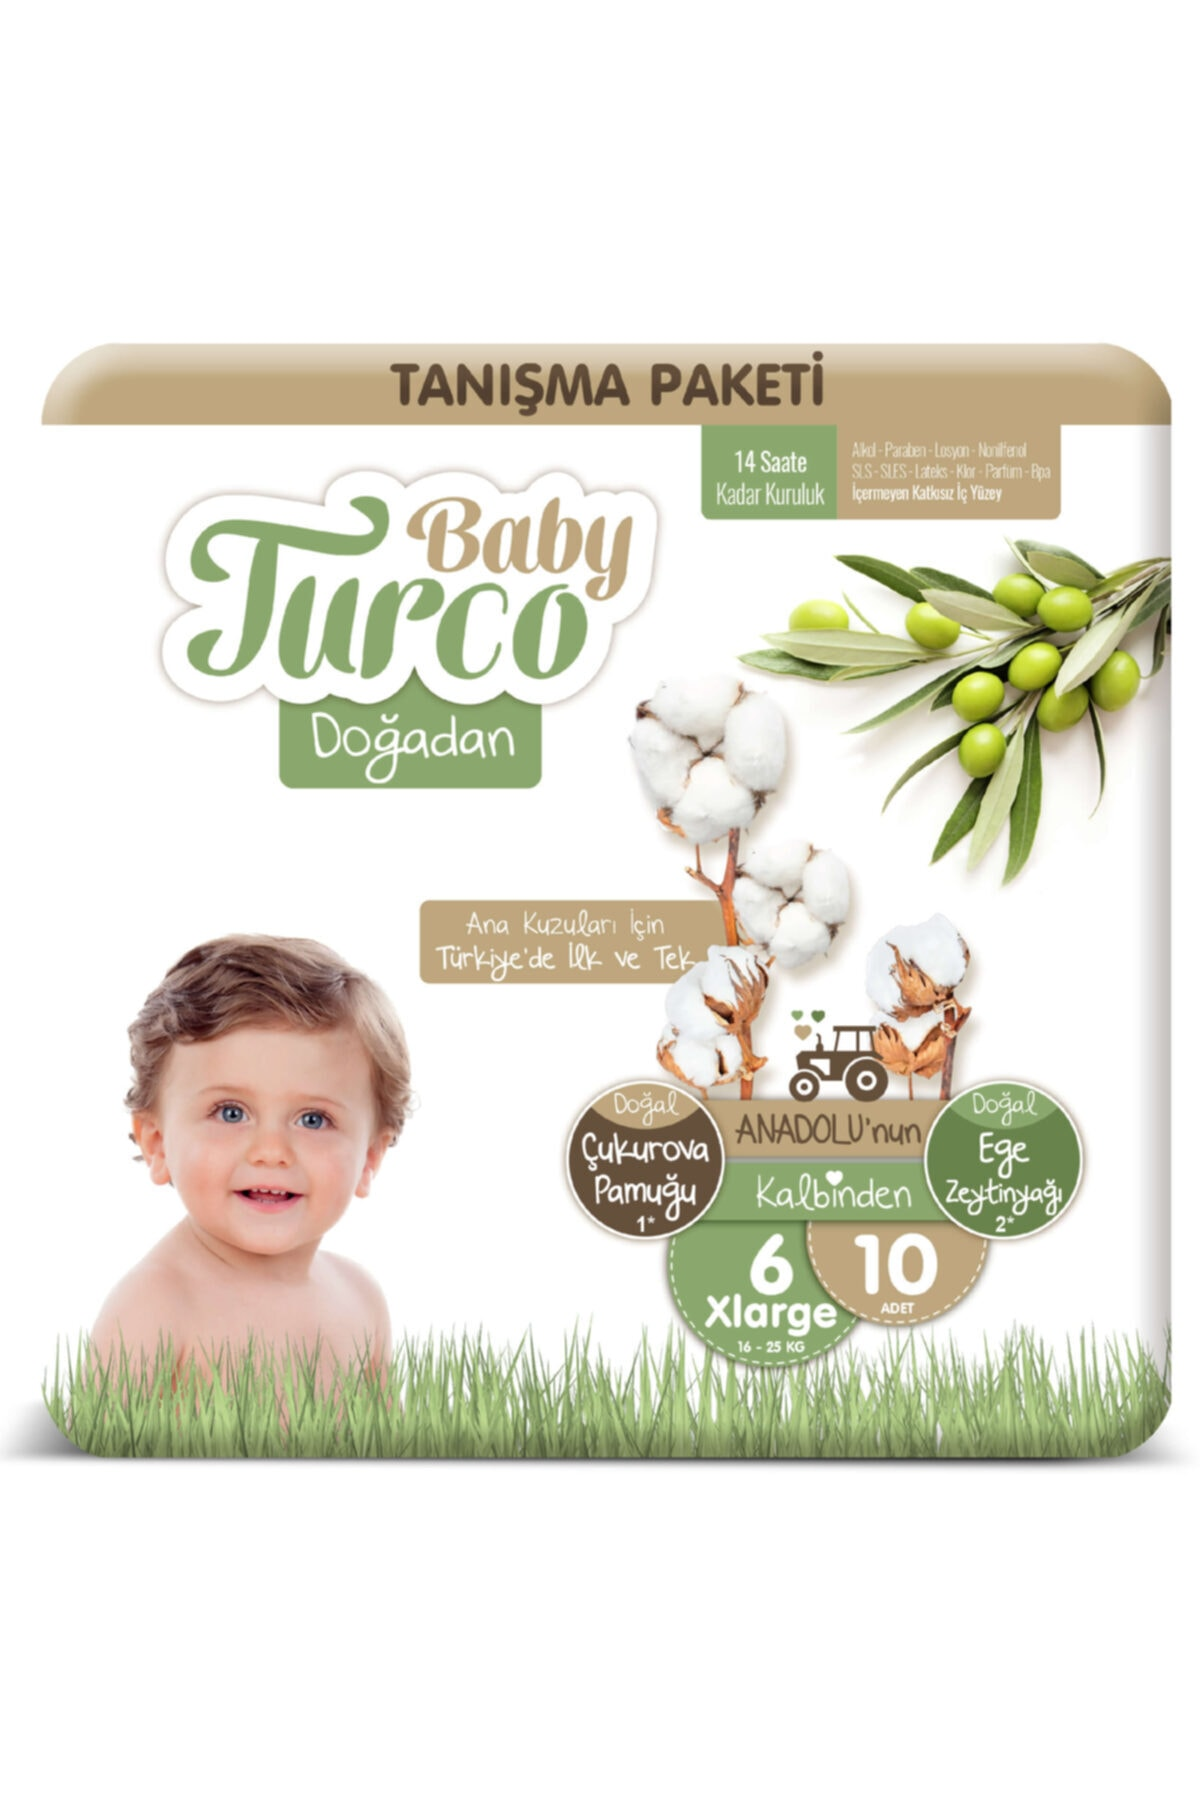 Baby Turco Doğadan 6 Numara Xlarge Tanışma Paketi 10 Adet 1